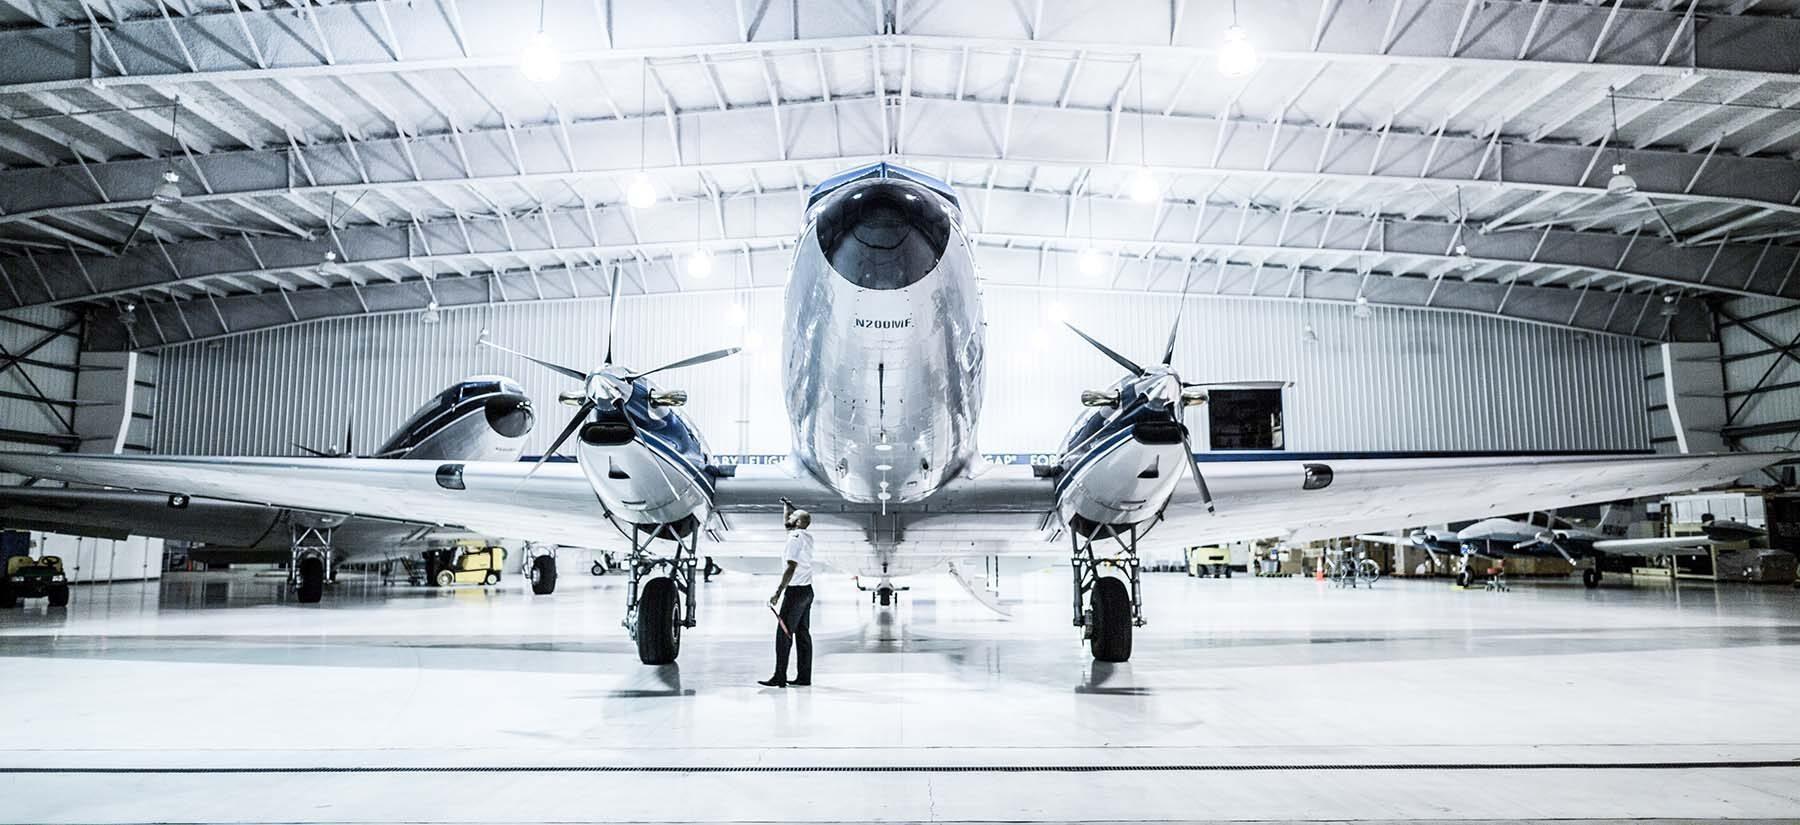 Luftfahrt-aspect-ratio-1800-825